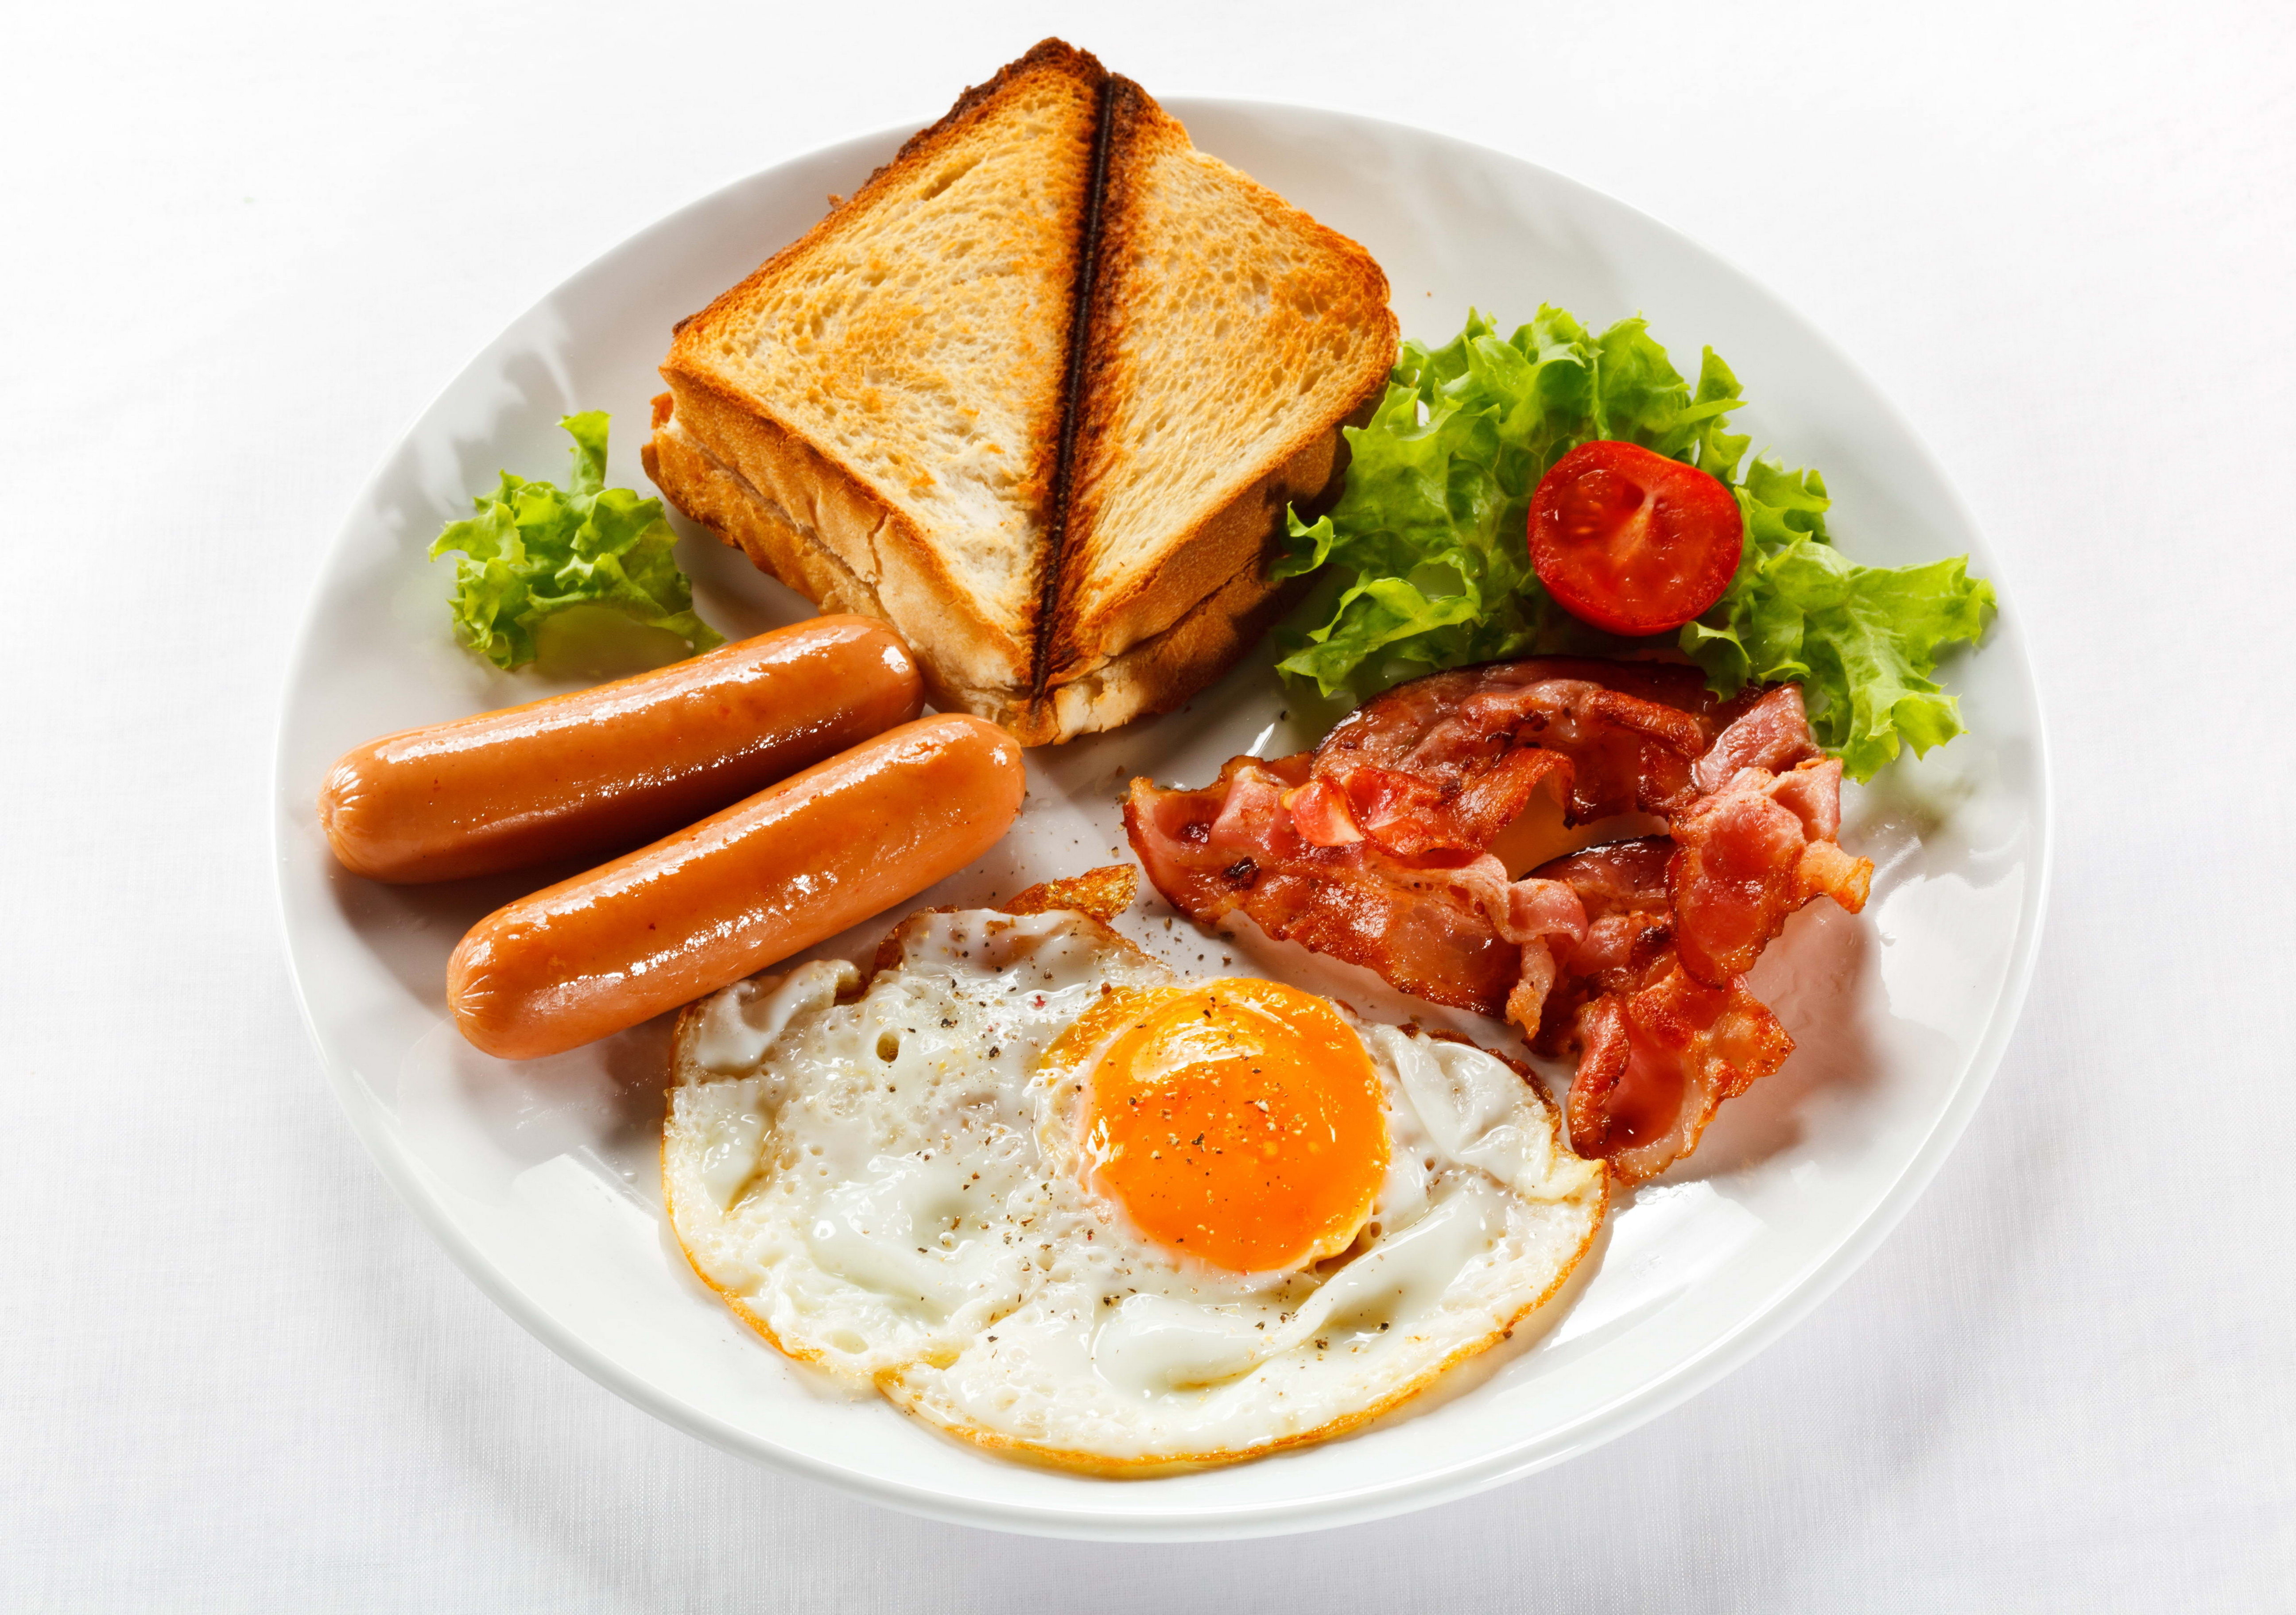 тарелка тосты завтрак plate toast Breakfast бесплатно